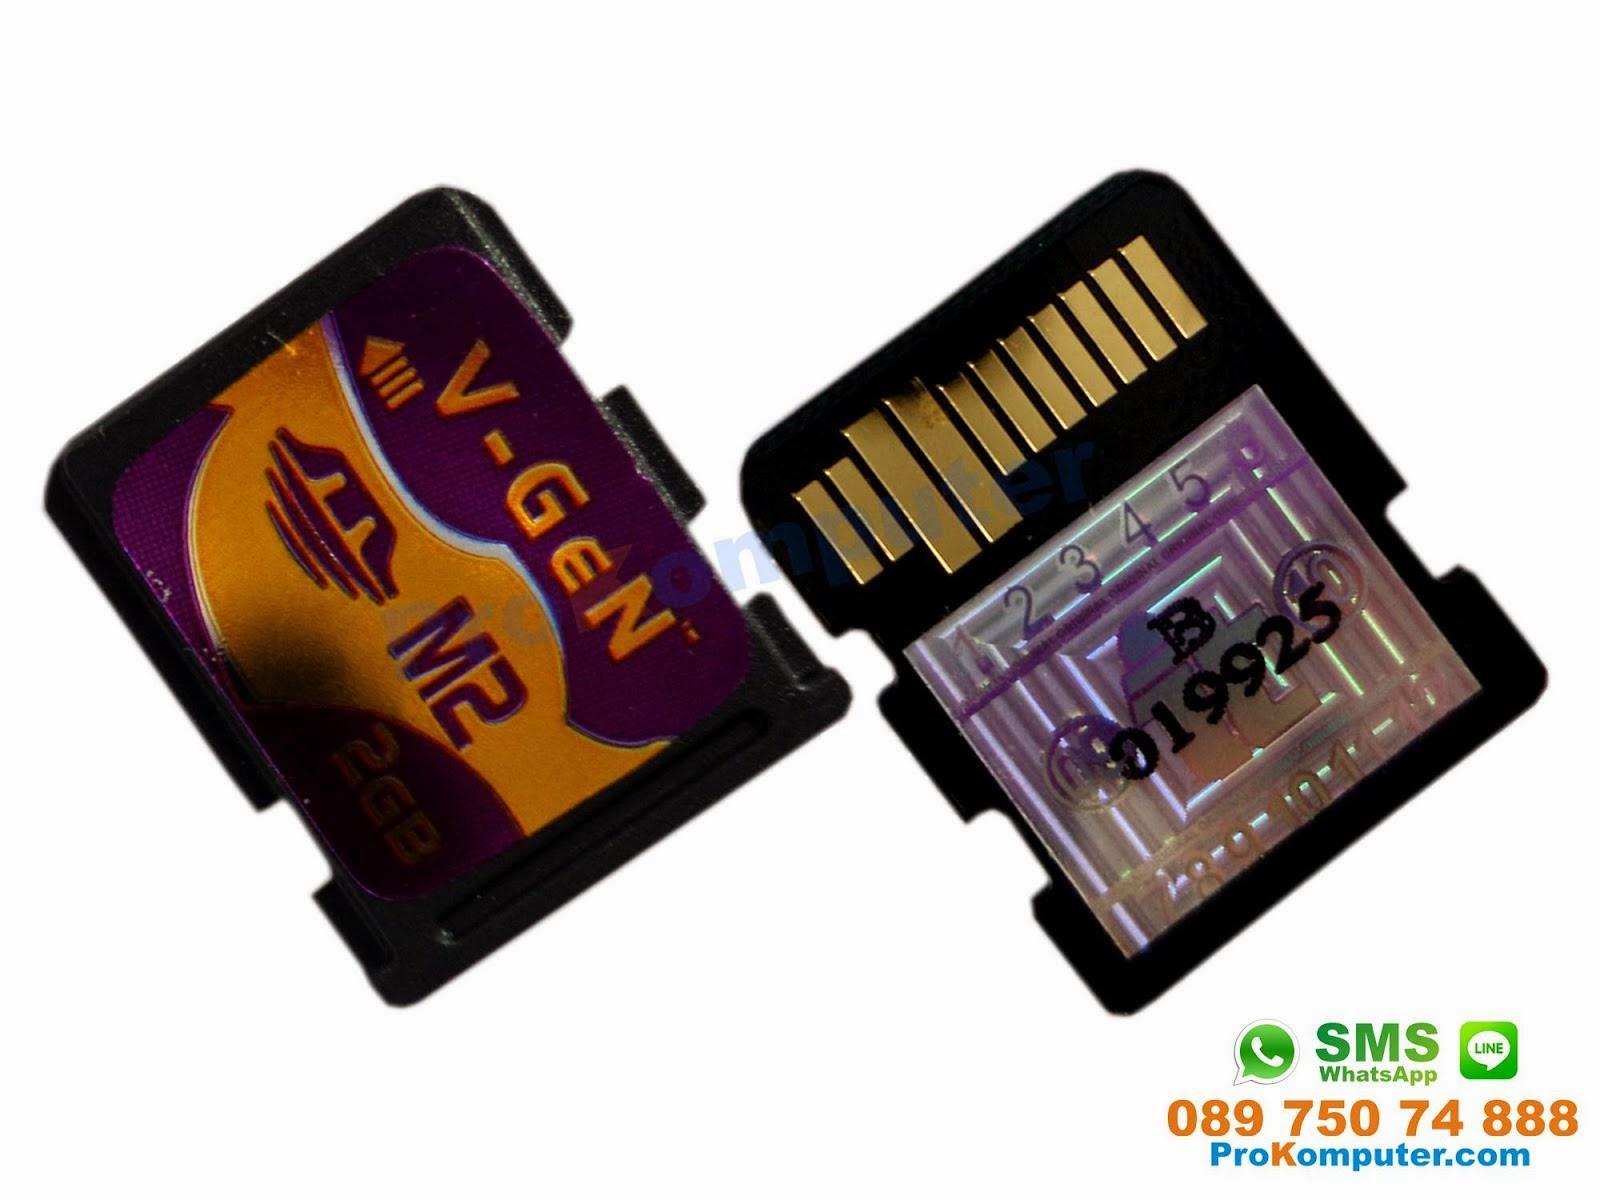 Prokomputer Memory Stick Micro M2 2gb Vgen Idm205x Hei5p 2 Gb